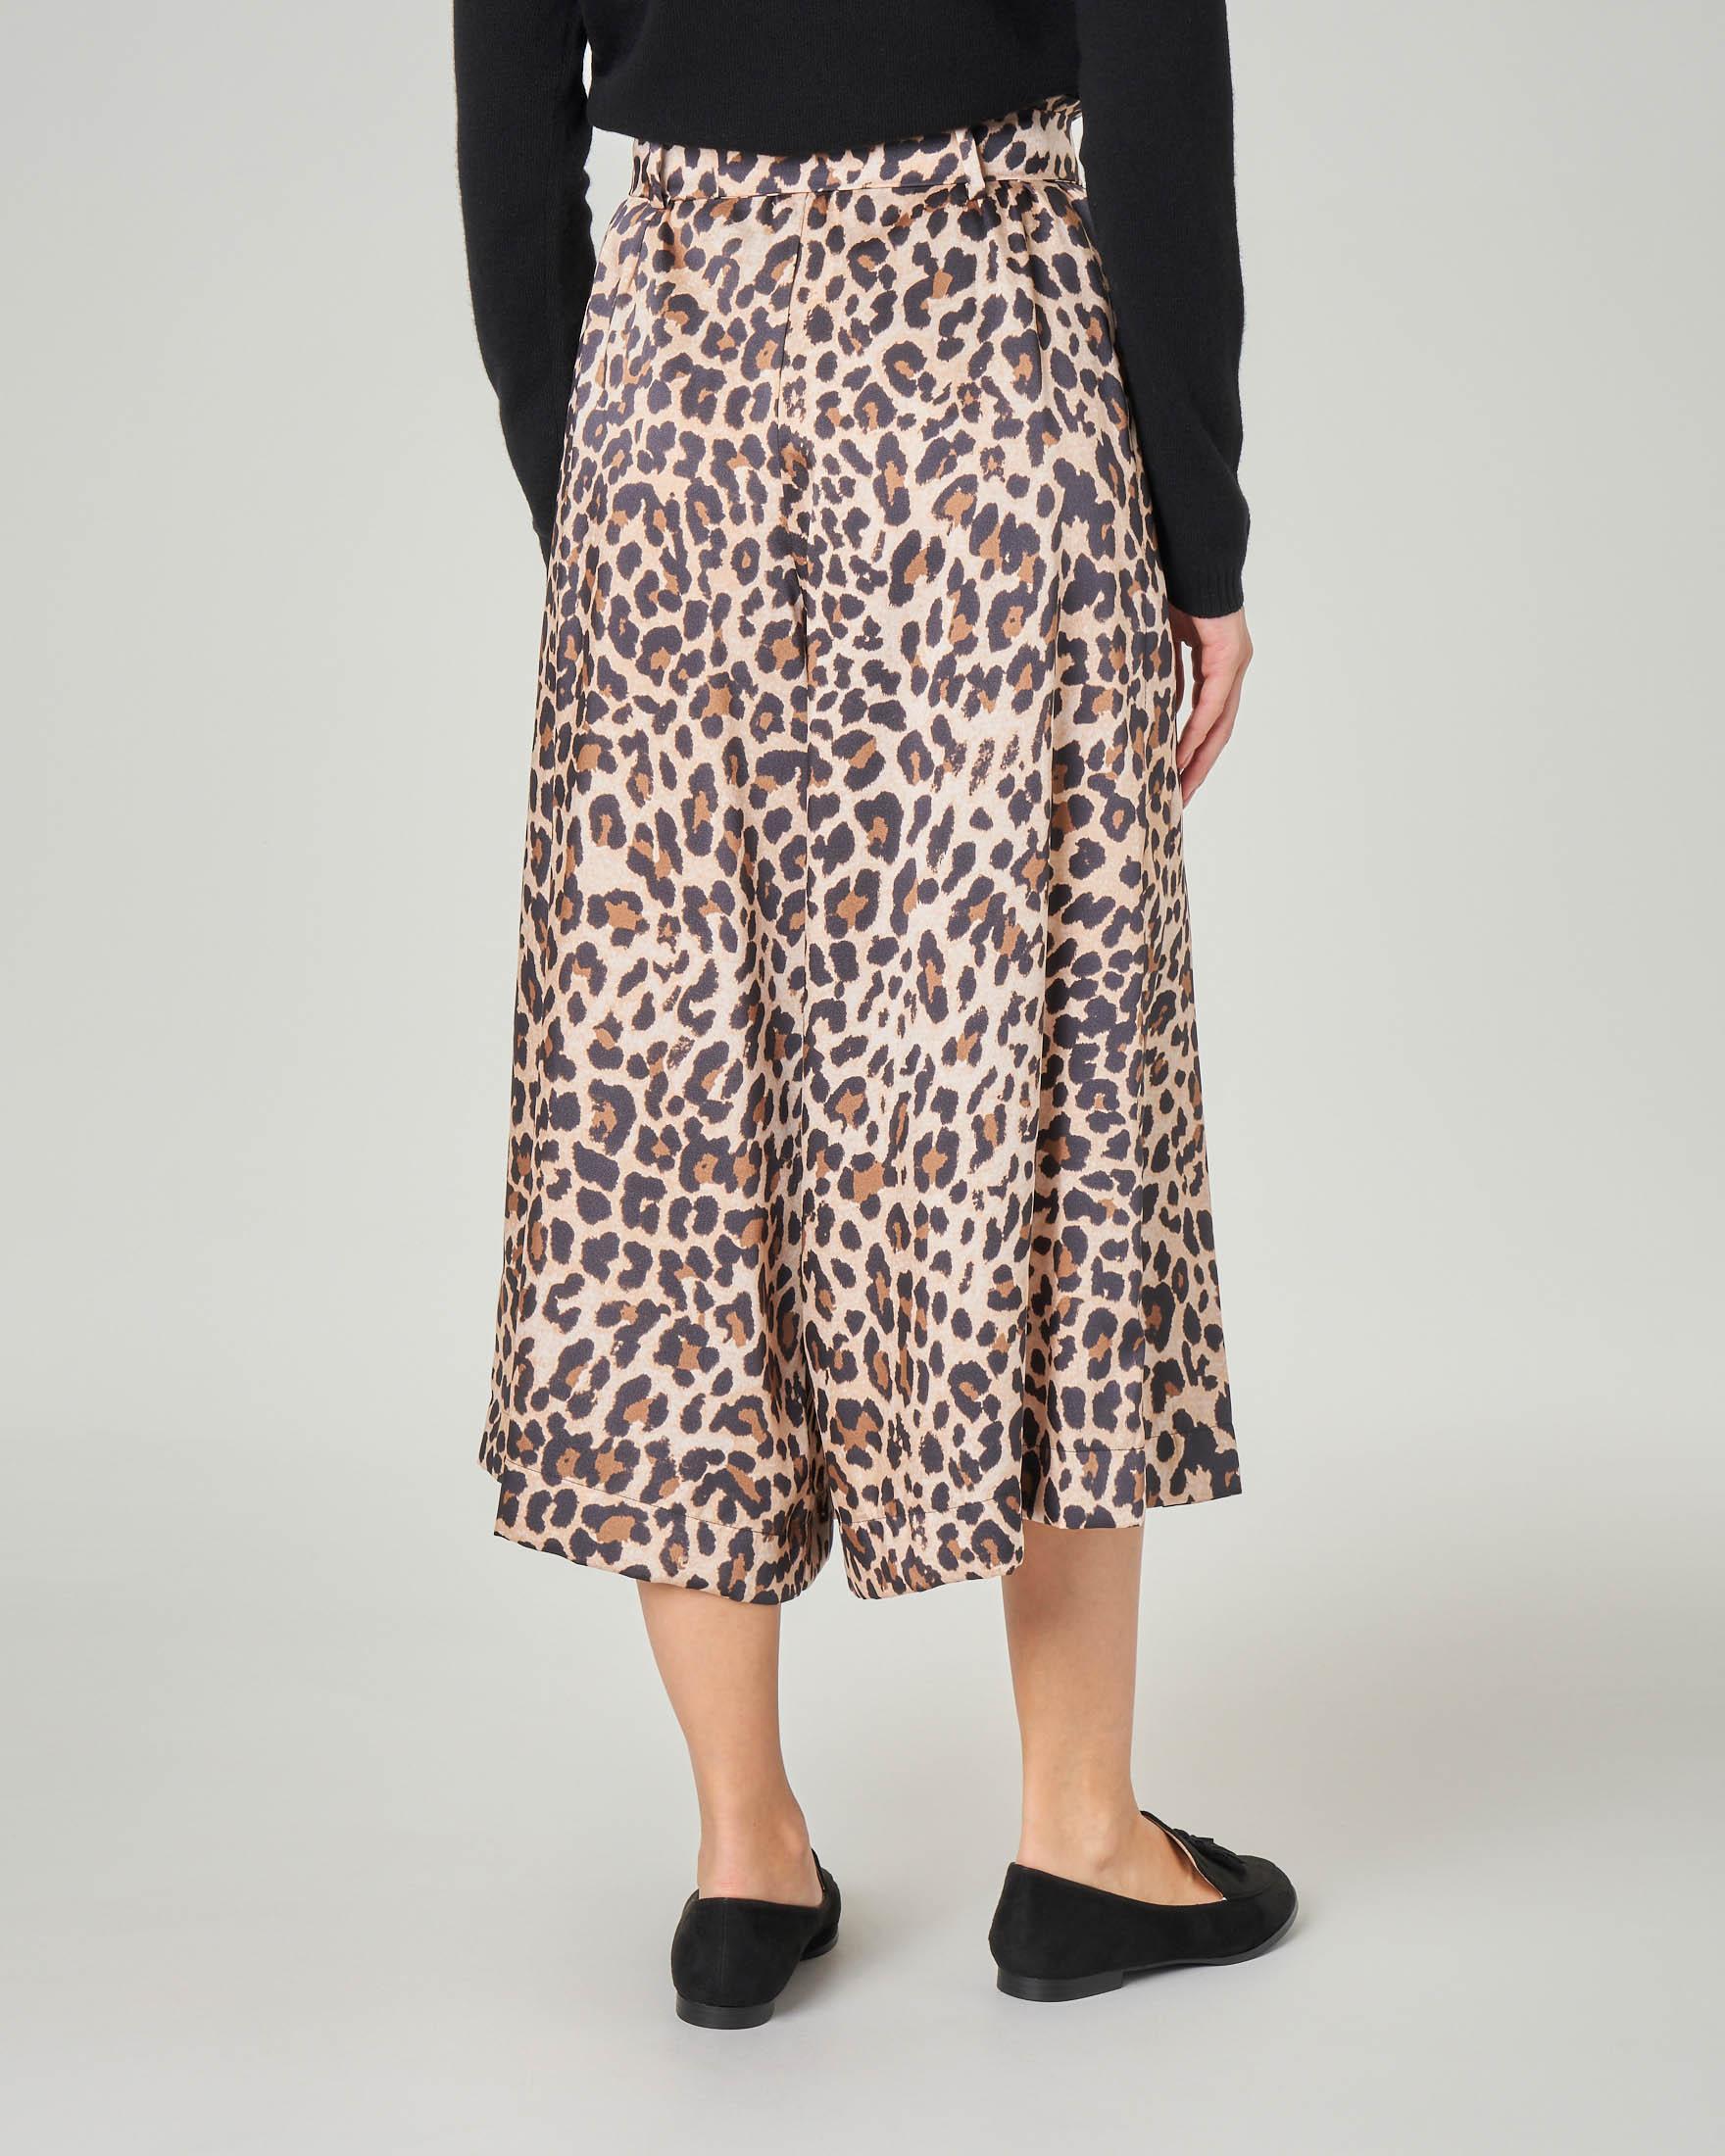 Pantaloni culotte a stampa animalier a vita alta